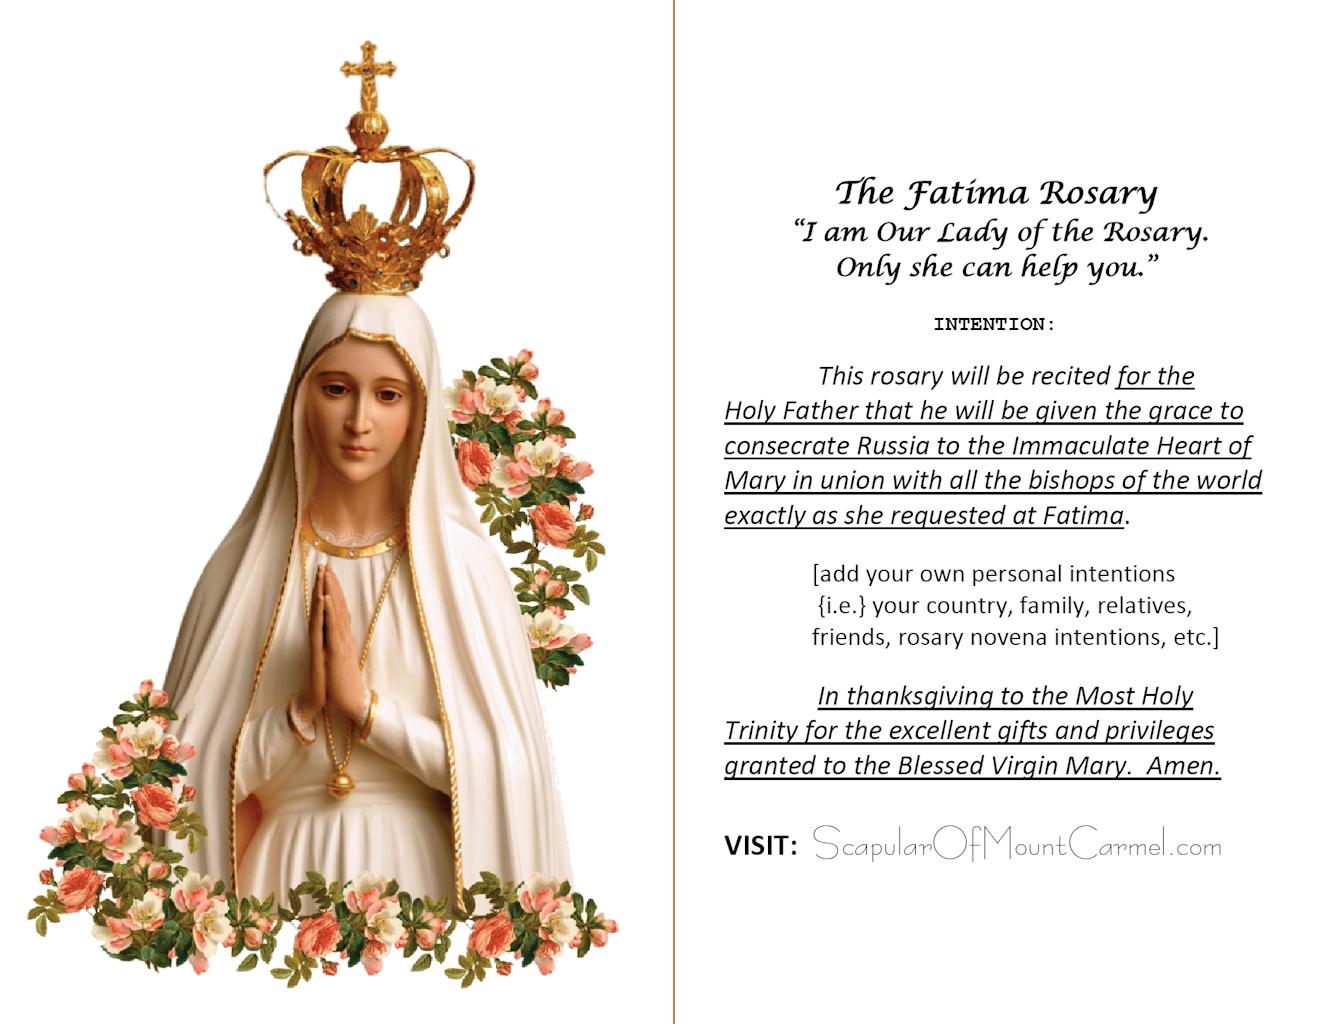 Fatima Rosary Prayer Card